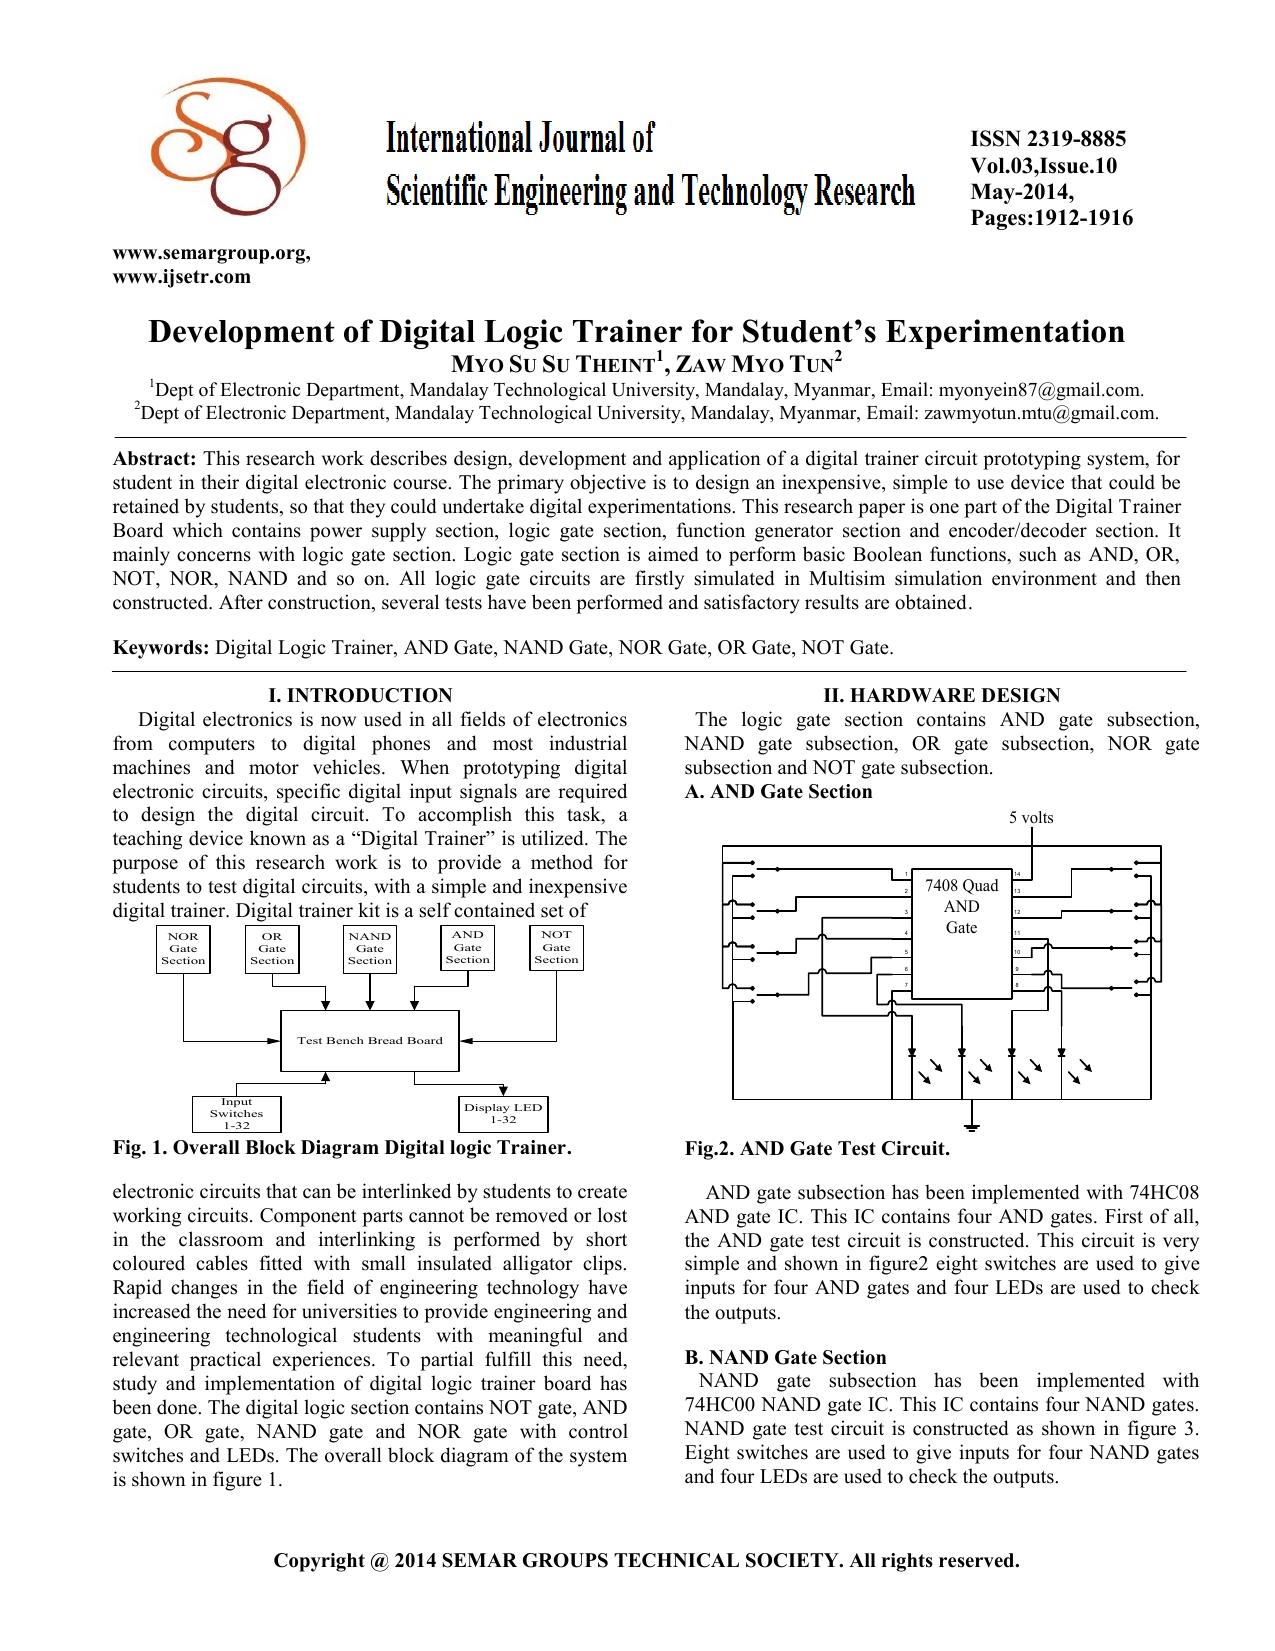 Development Of Digital Logic Trainer For Students Experimentation Nand Gate Circuit Diagram